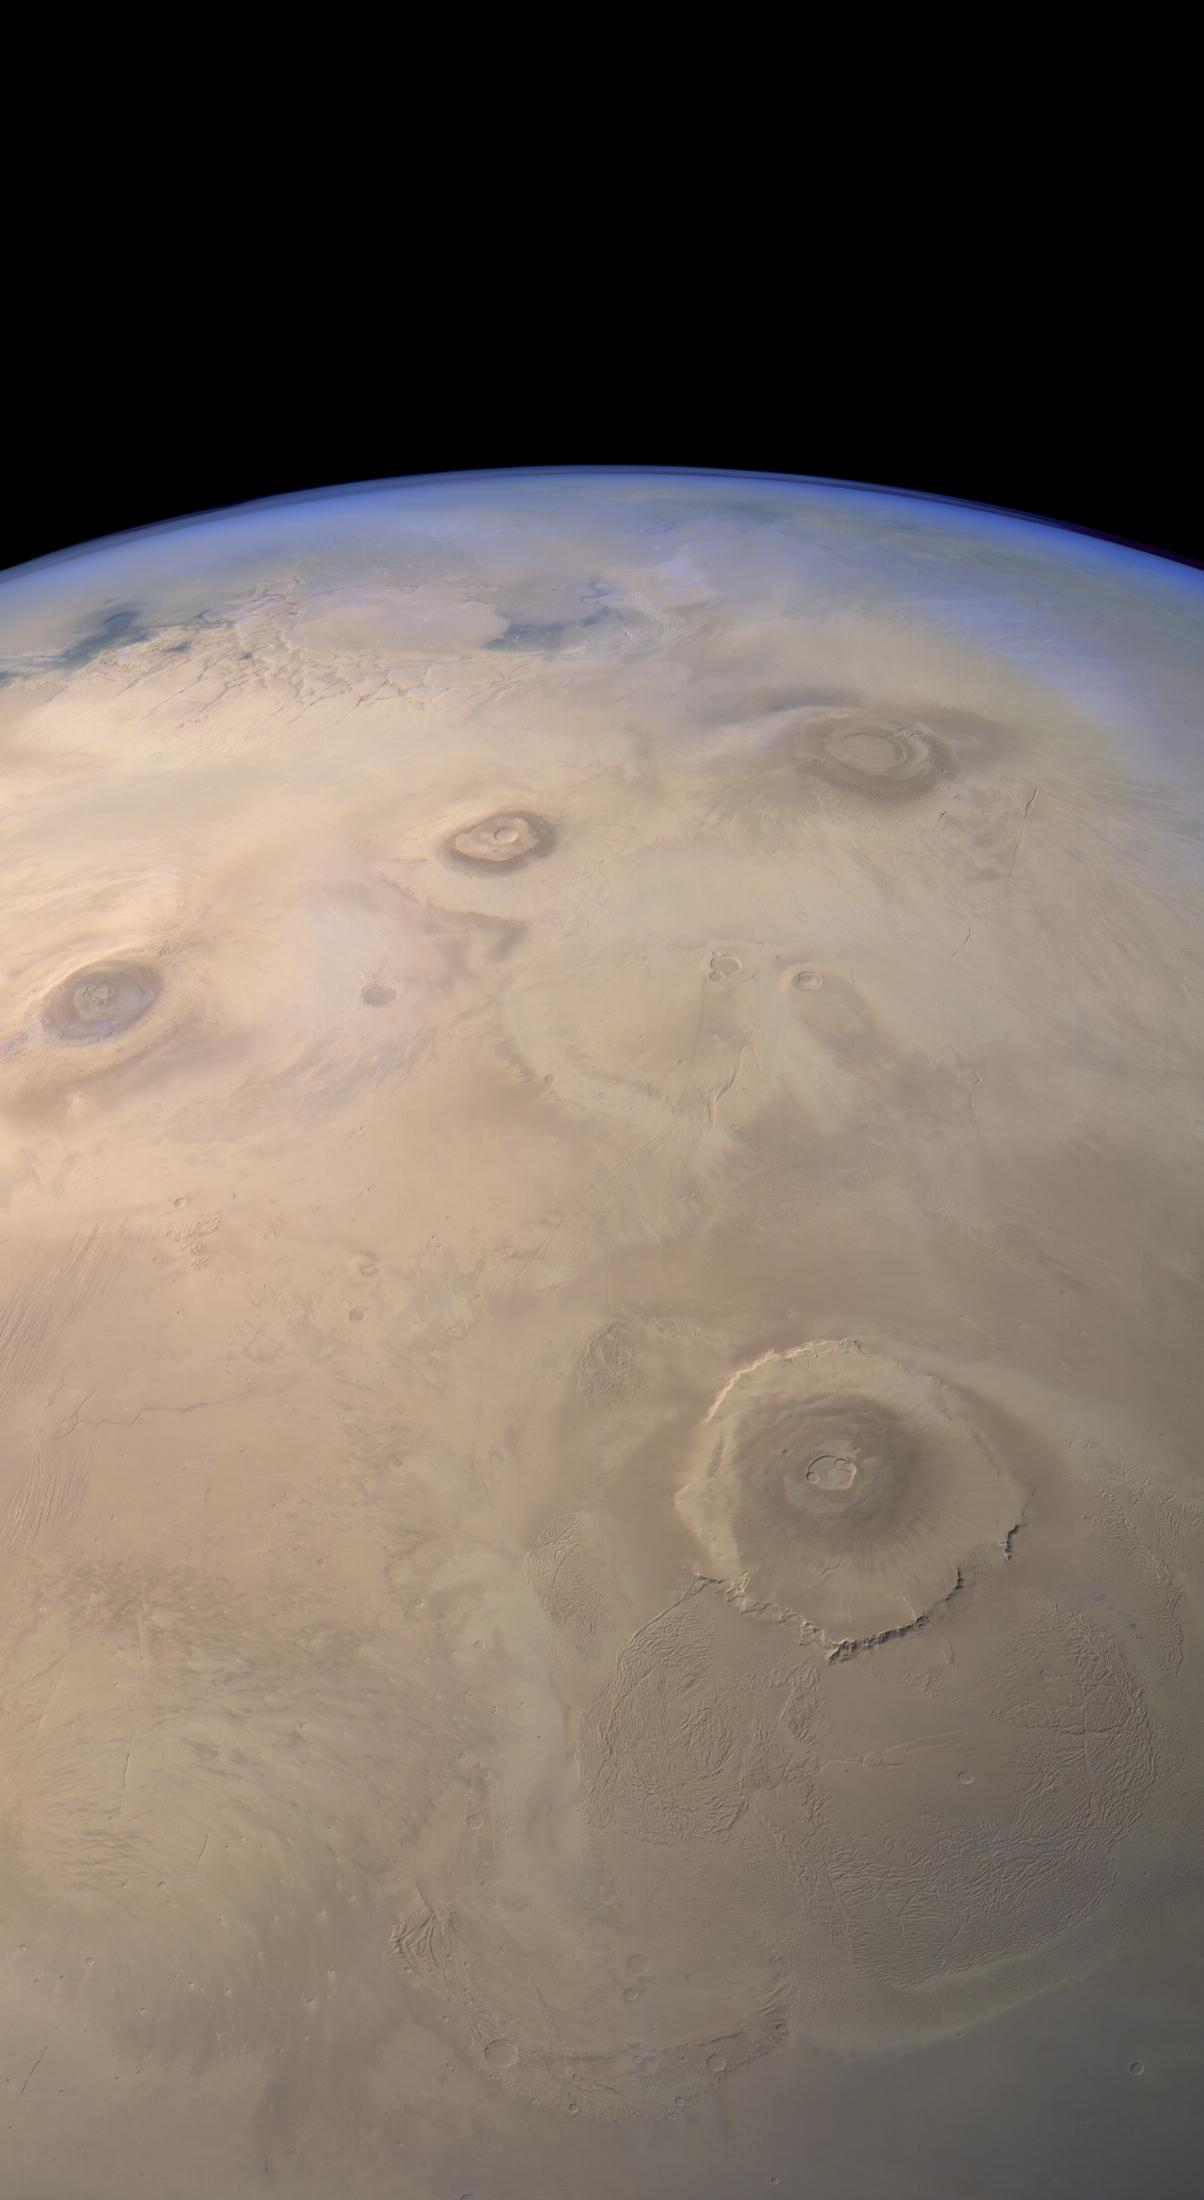 http://planetary.s3.amazonaws.com/assets/images/4-mars/2016/20160126_23843525423_5fd03caf55_o.jpg